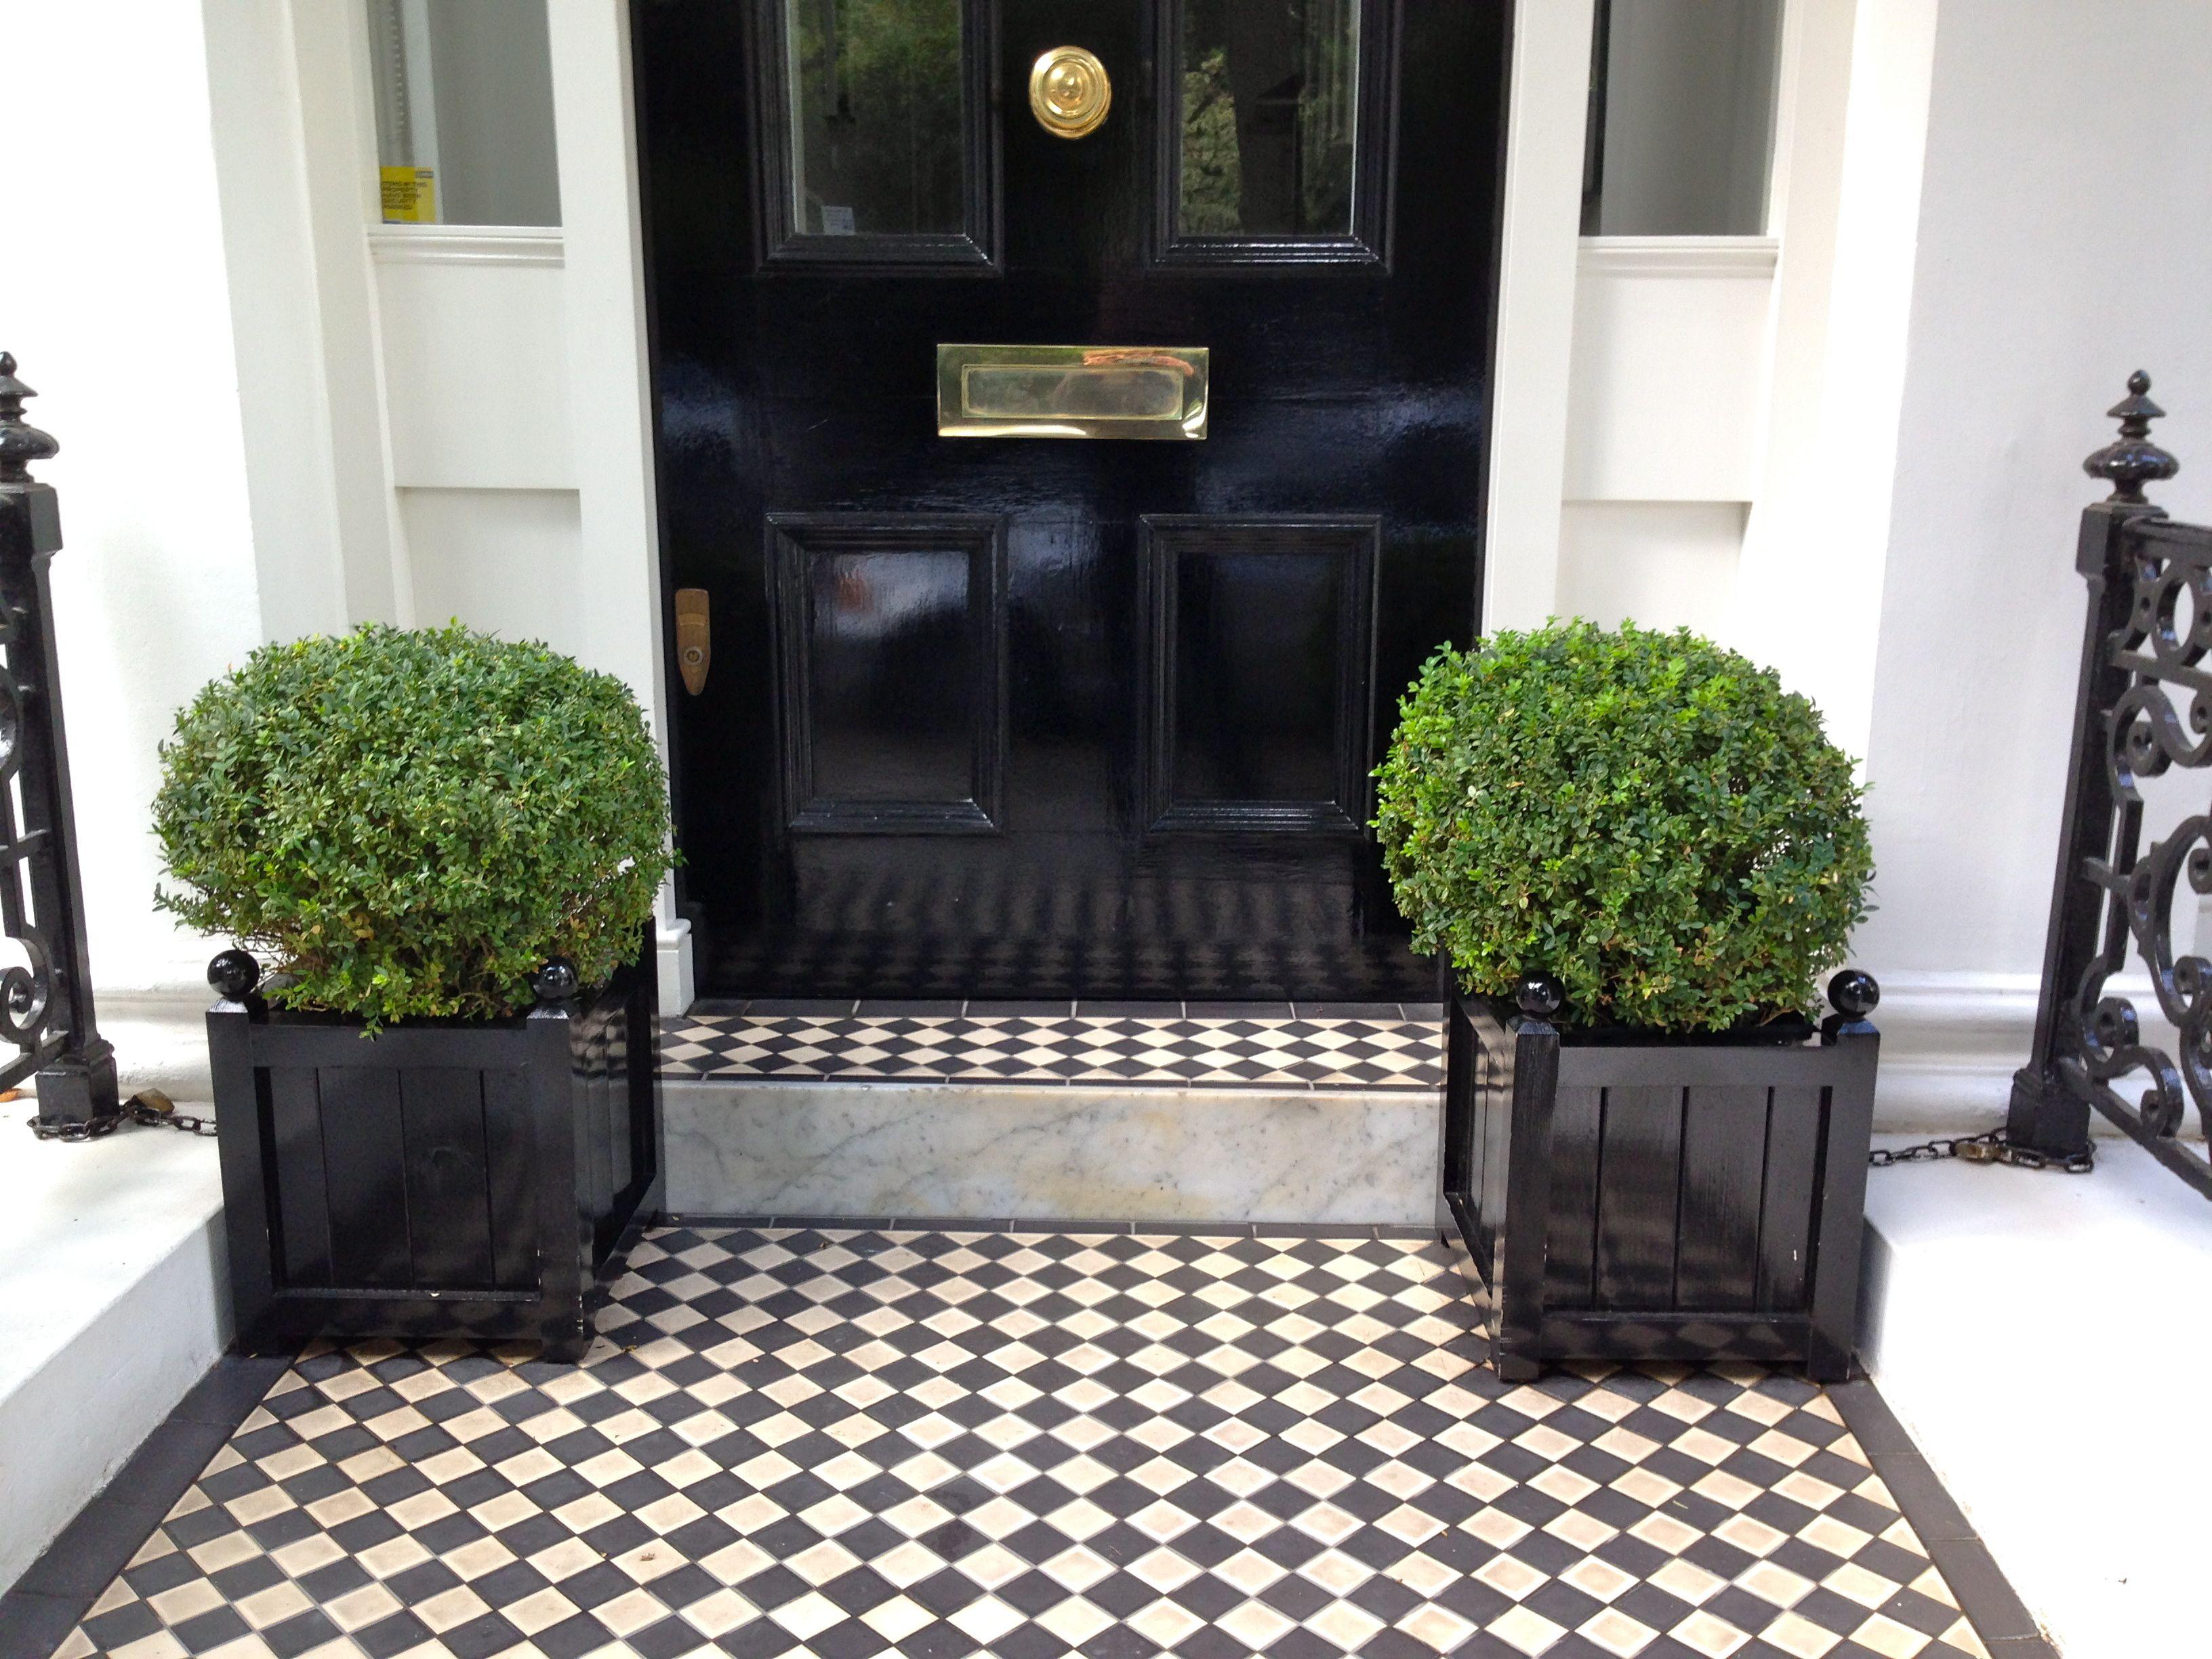 London Townhouse Exterior Black And White Tile Google Search Outdoor Entryway Entryway Tile Exterior Tiles